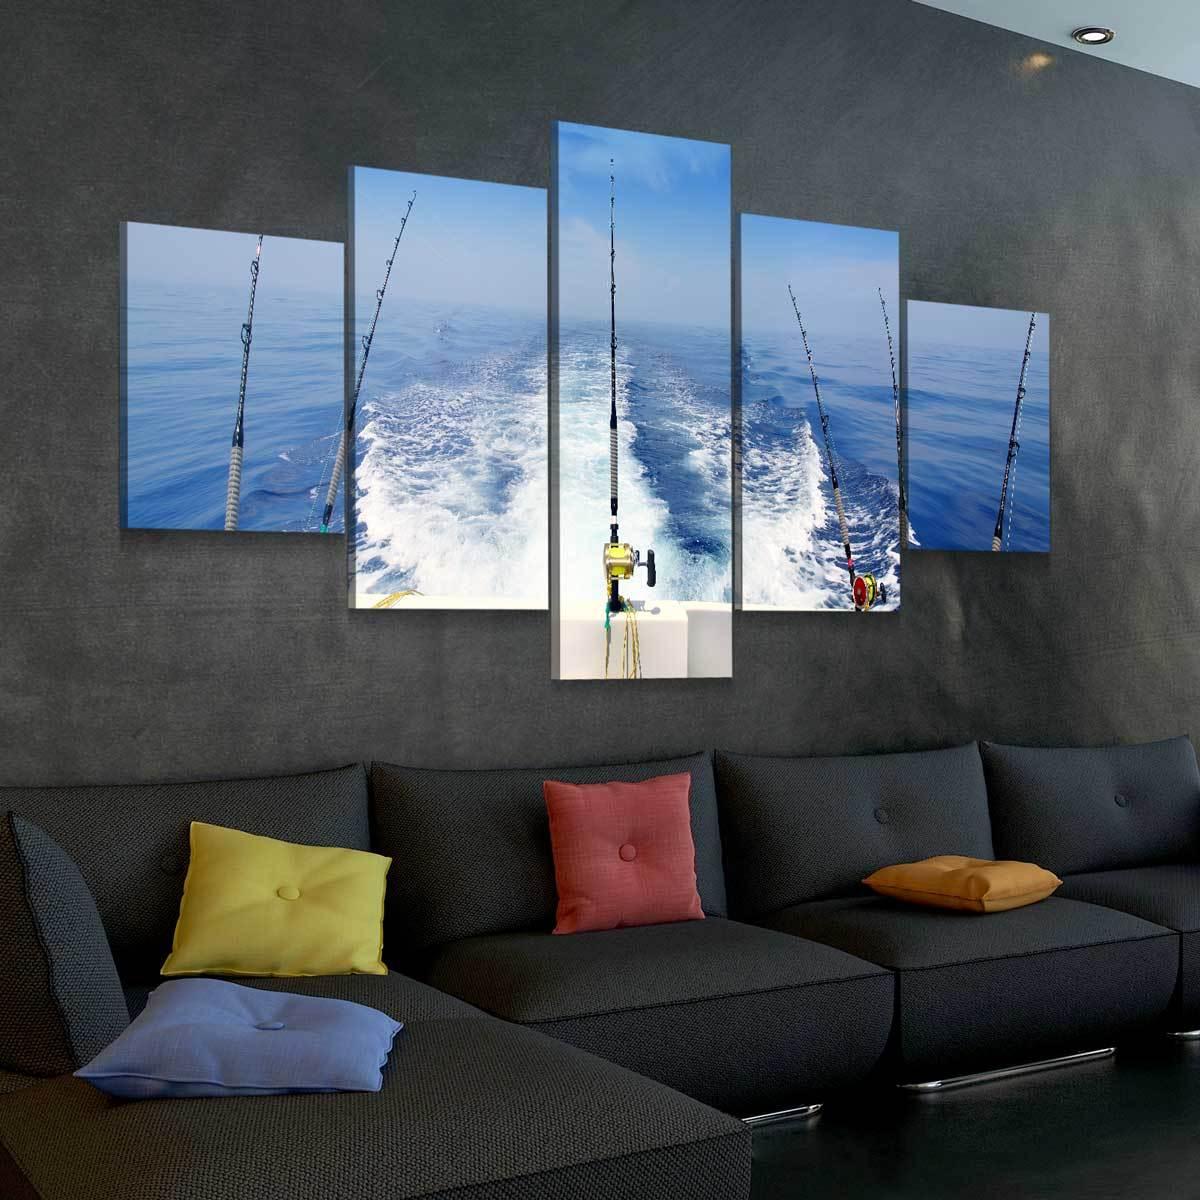 Deep Sea Fishing 5 panel canvas wall art